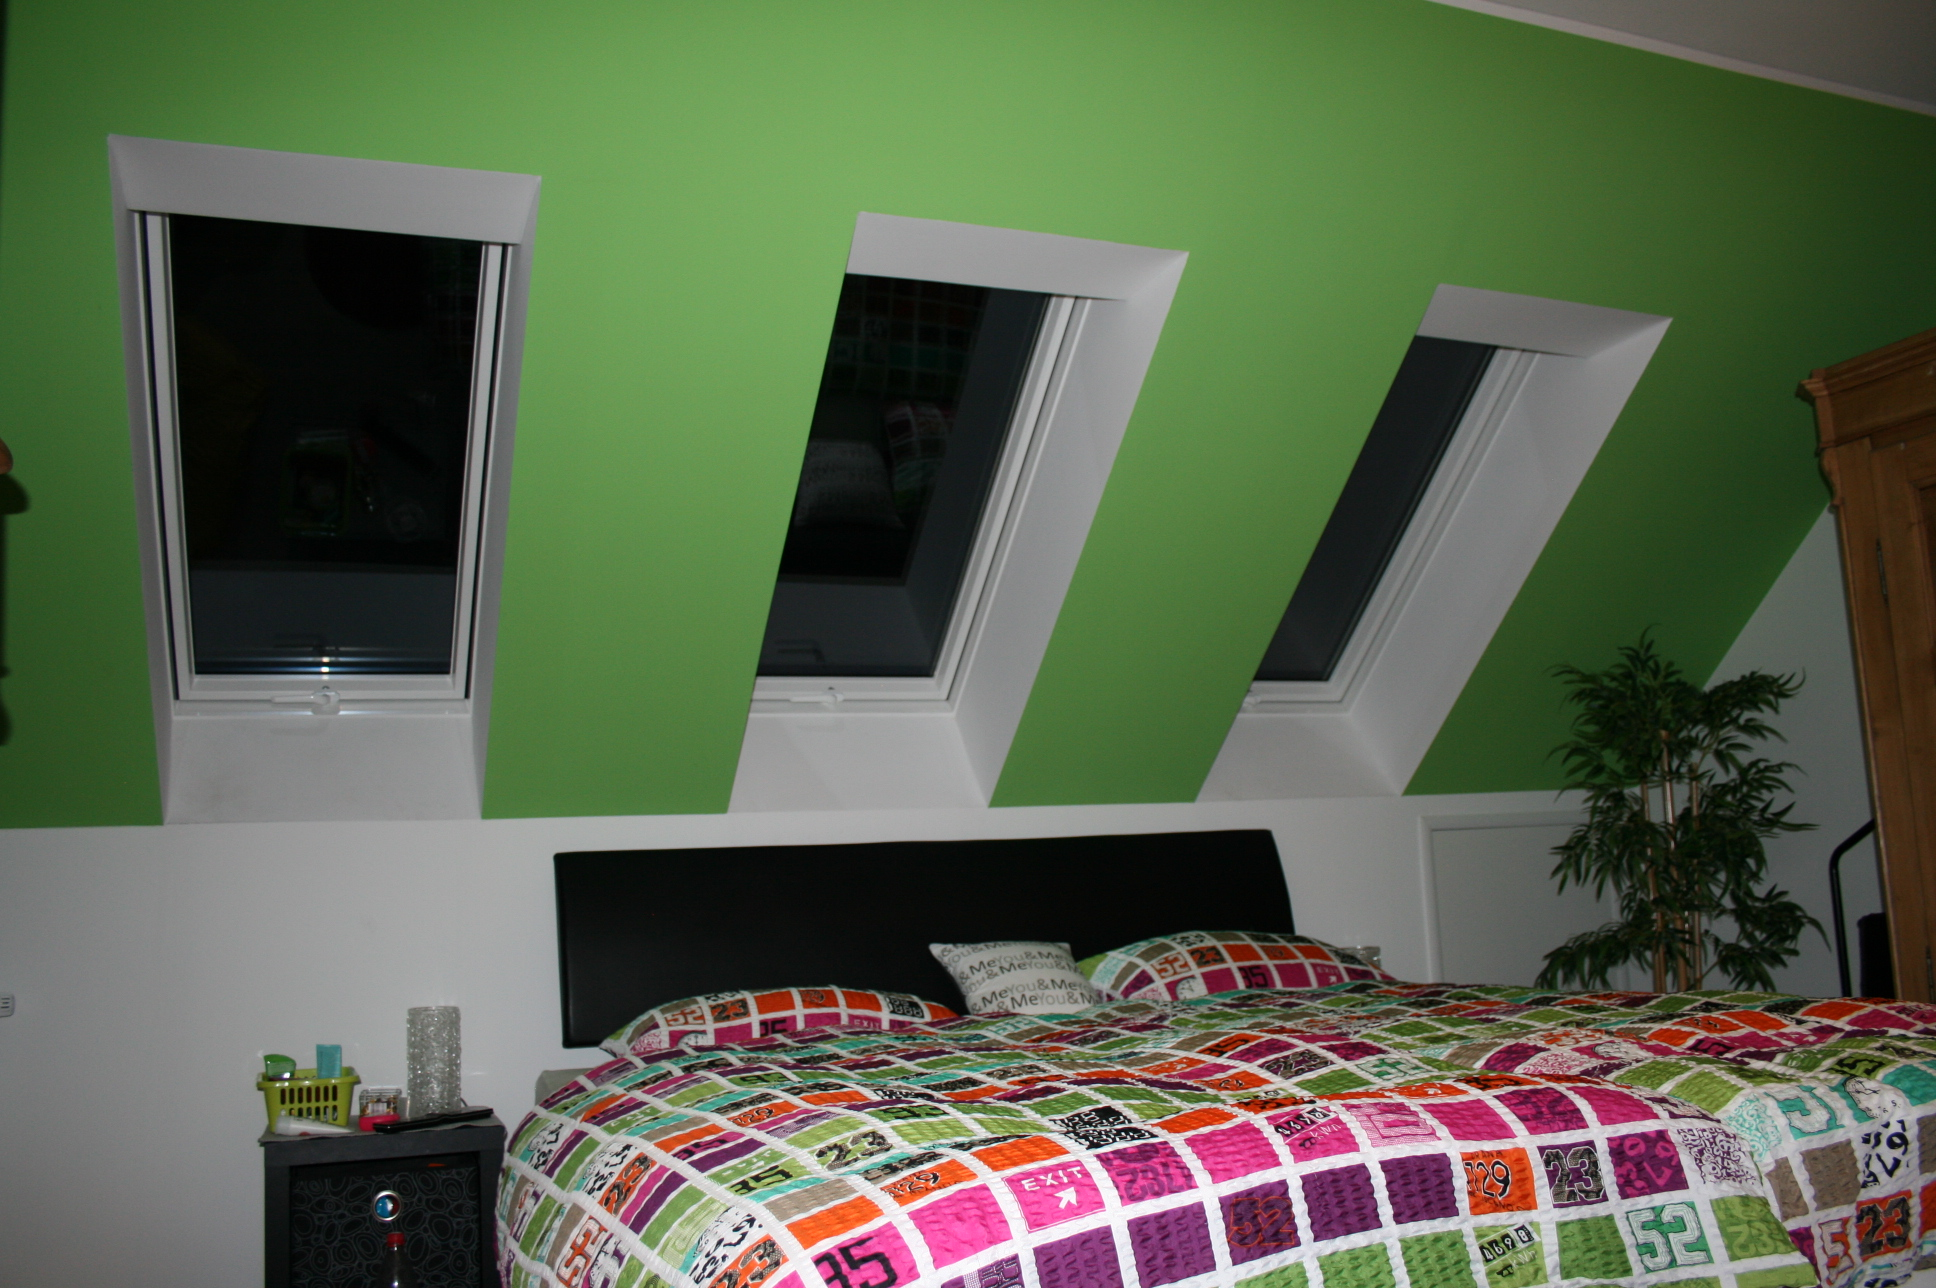 schlafzimmer farbig gestalten. Black Bedroom Furniture Sets. Home Design Ideas